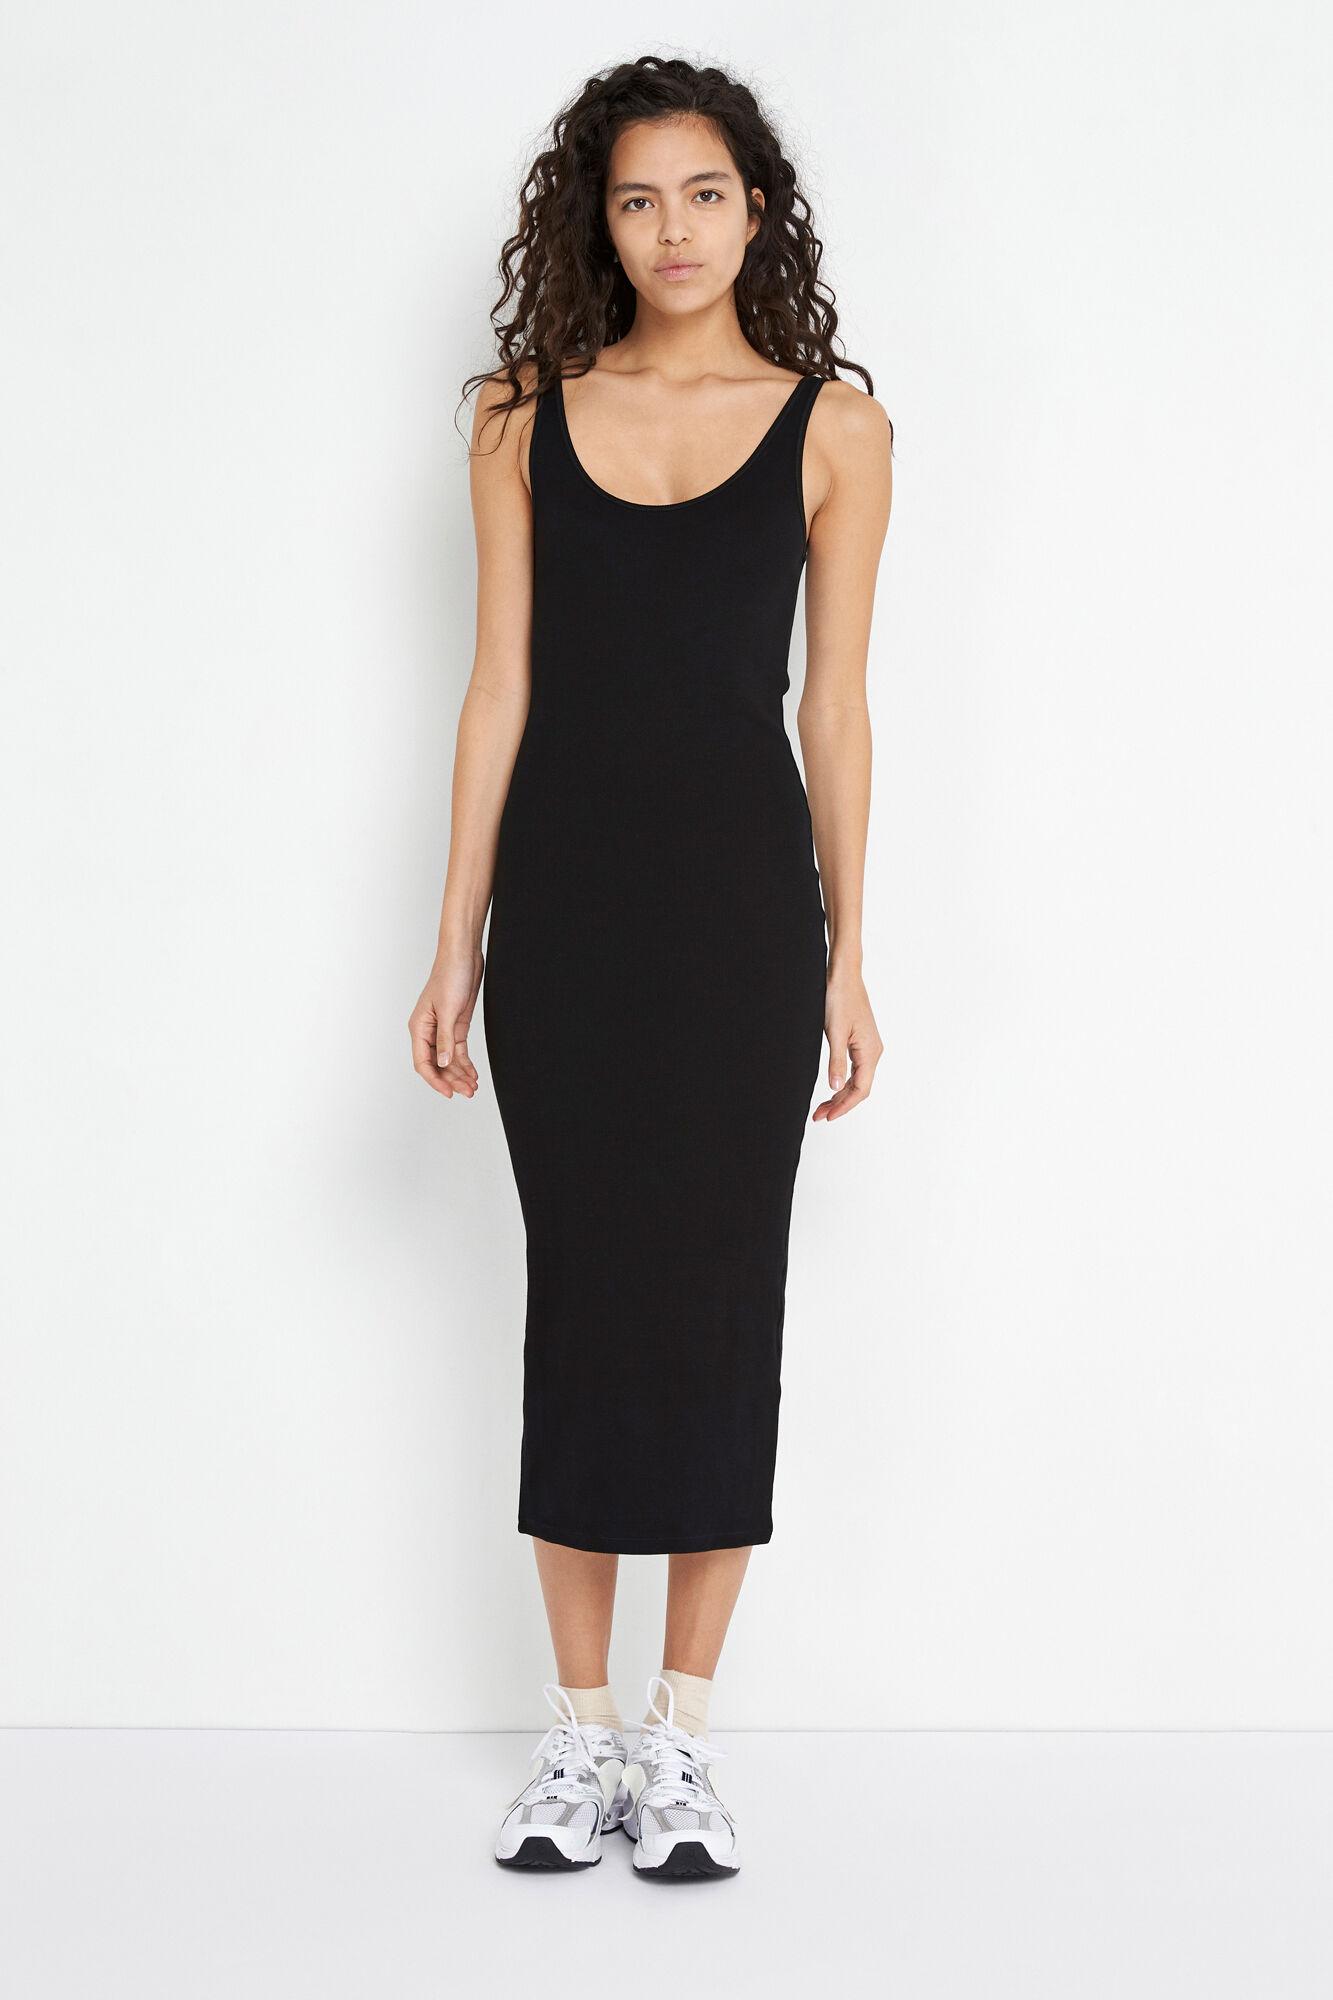 ENALLY SL DRESS 5314, BLACK